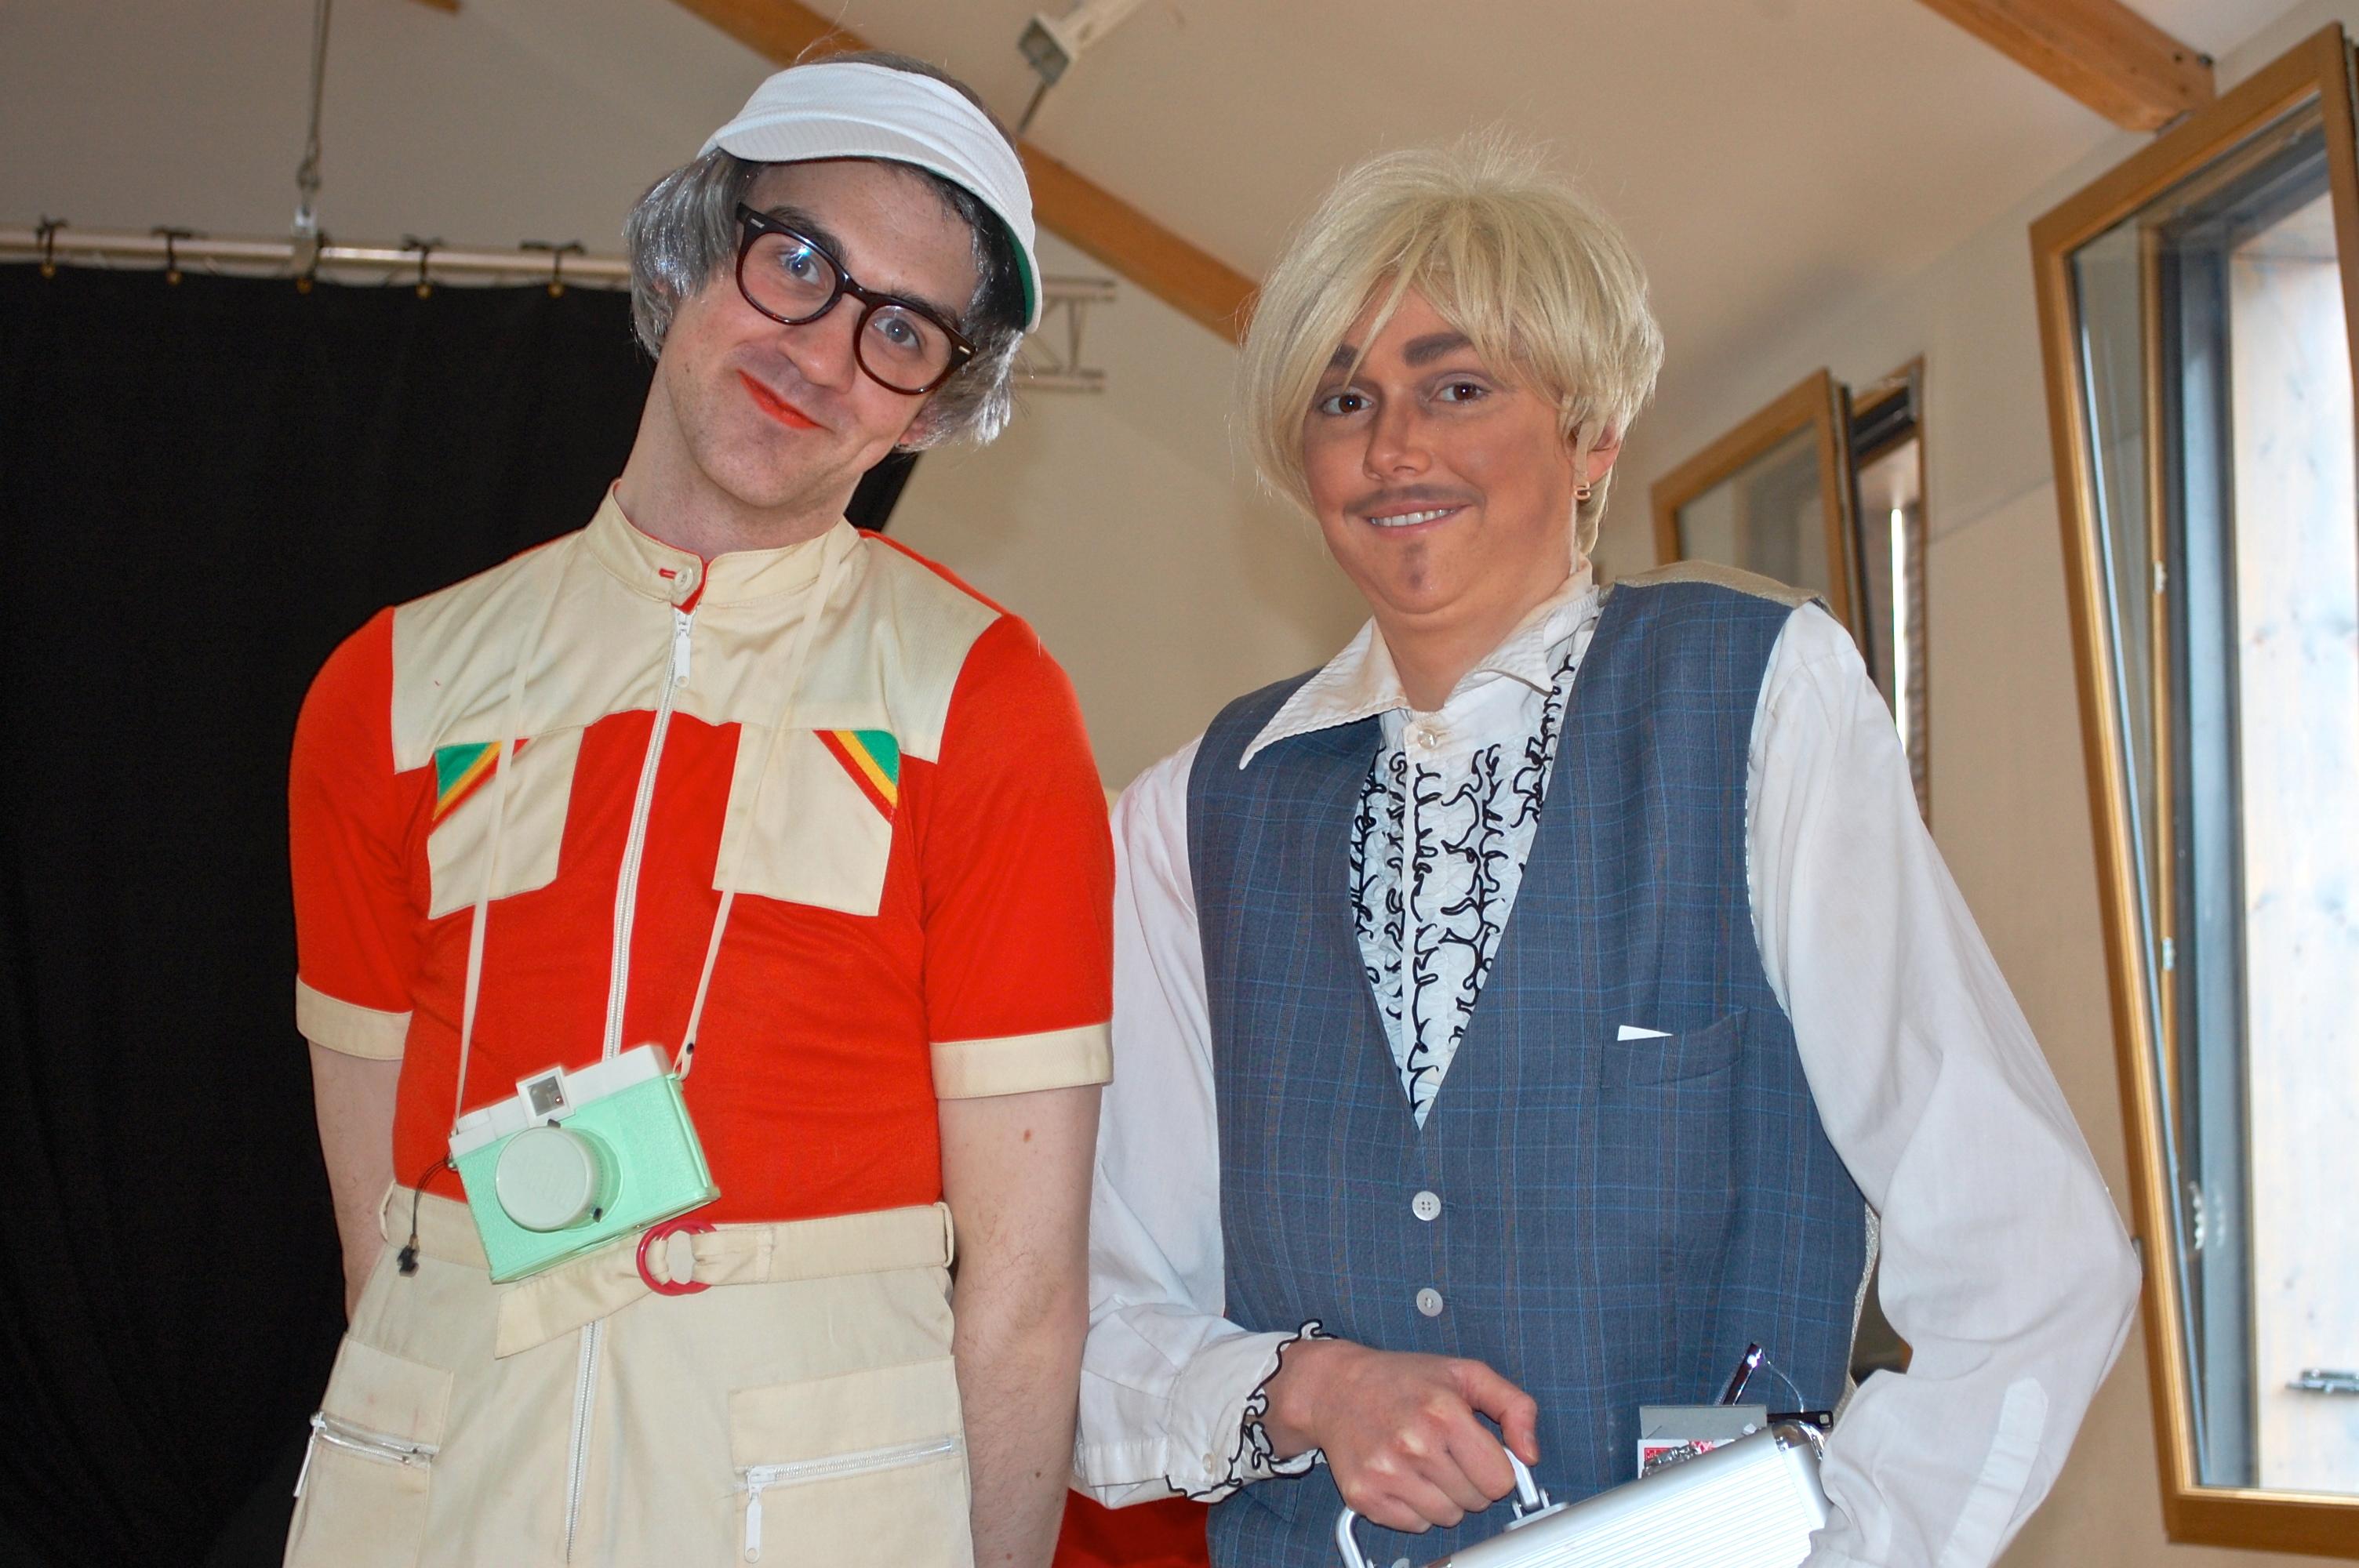 Elf Lyons & Ryan Lane - Work in Progress - HILDA & THE SPECTRUM